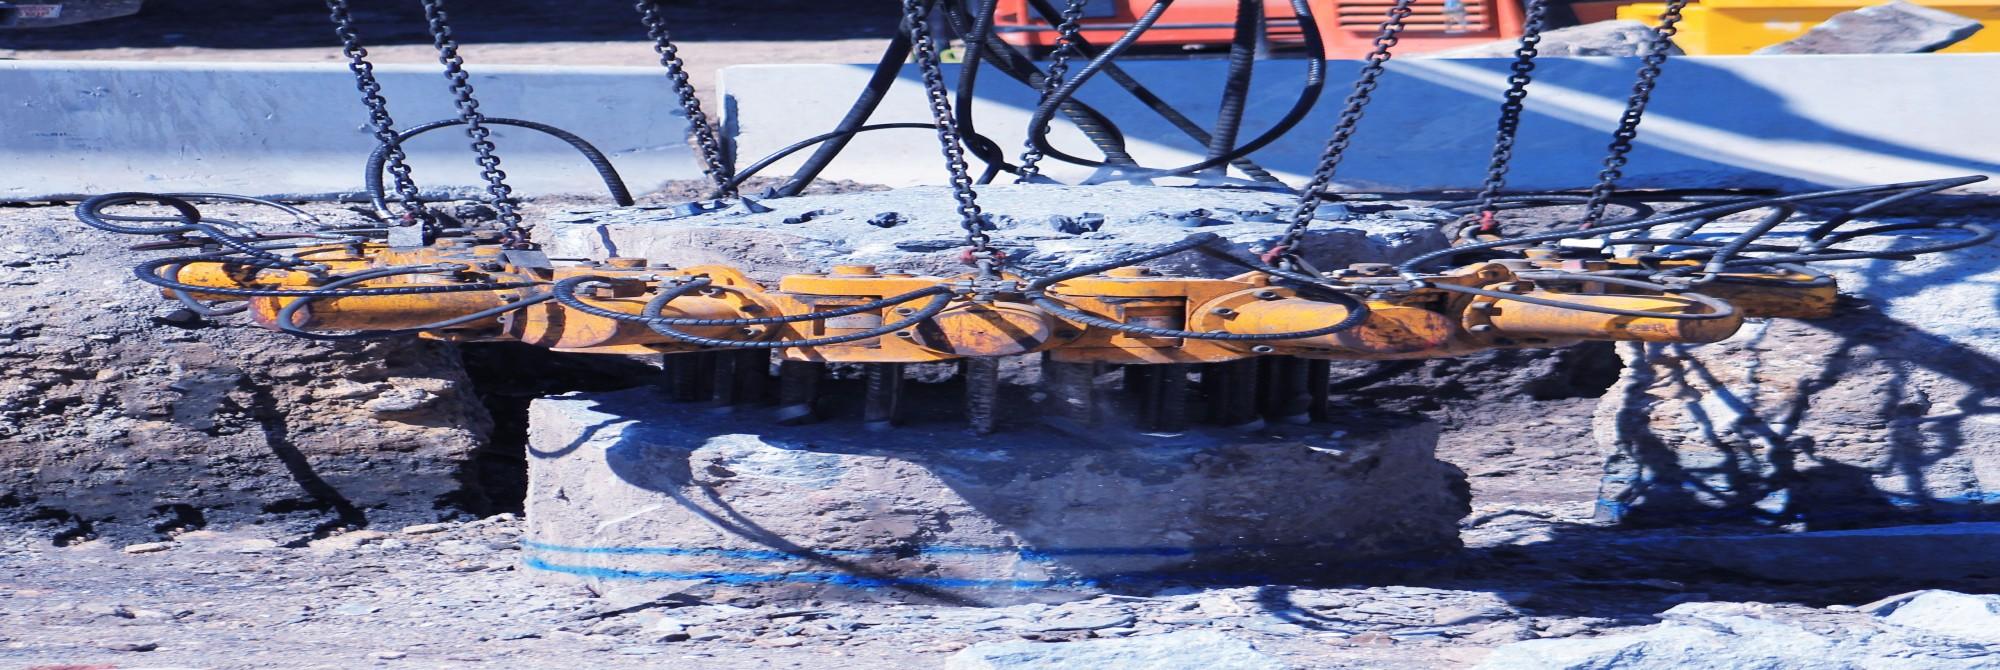 Concrete Pile Breakers